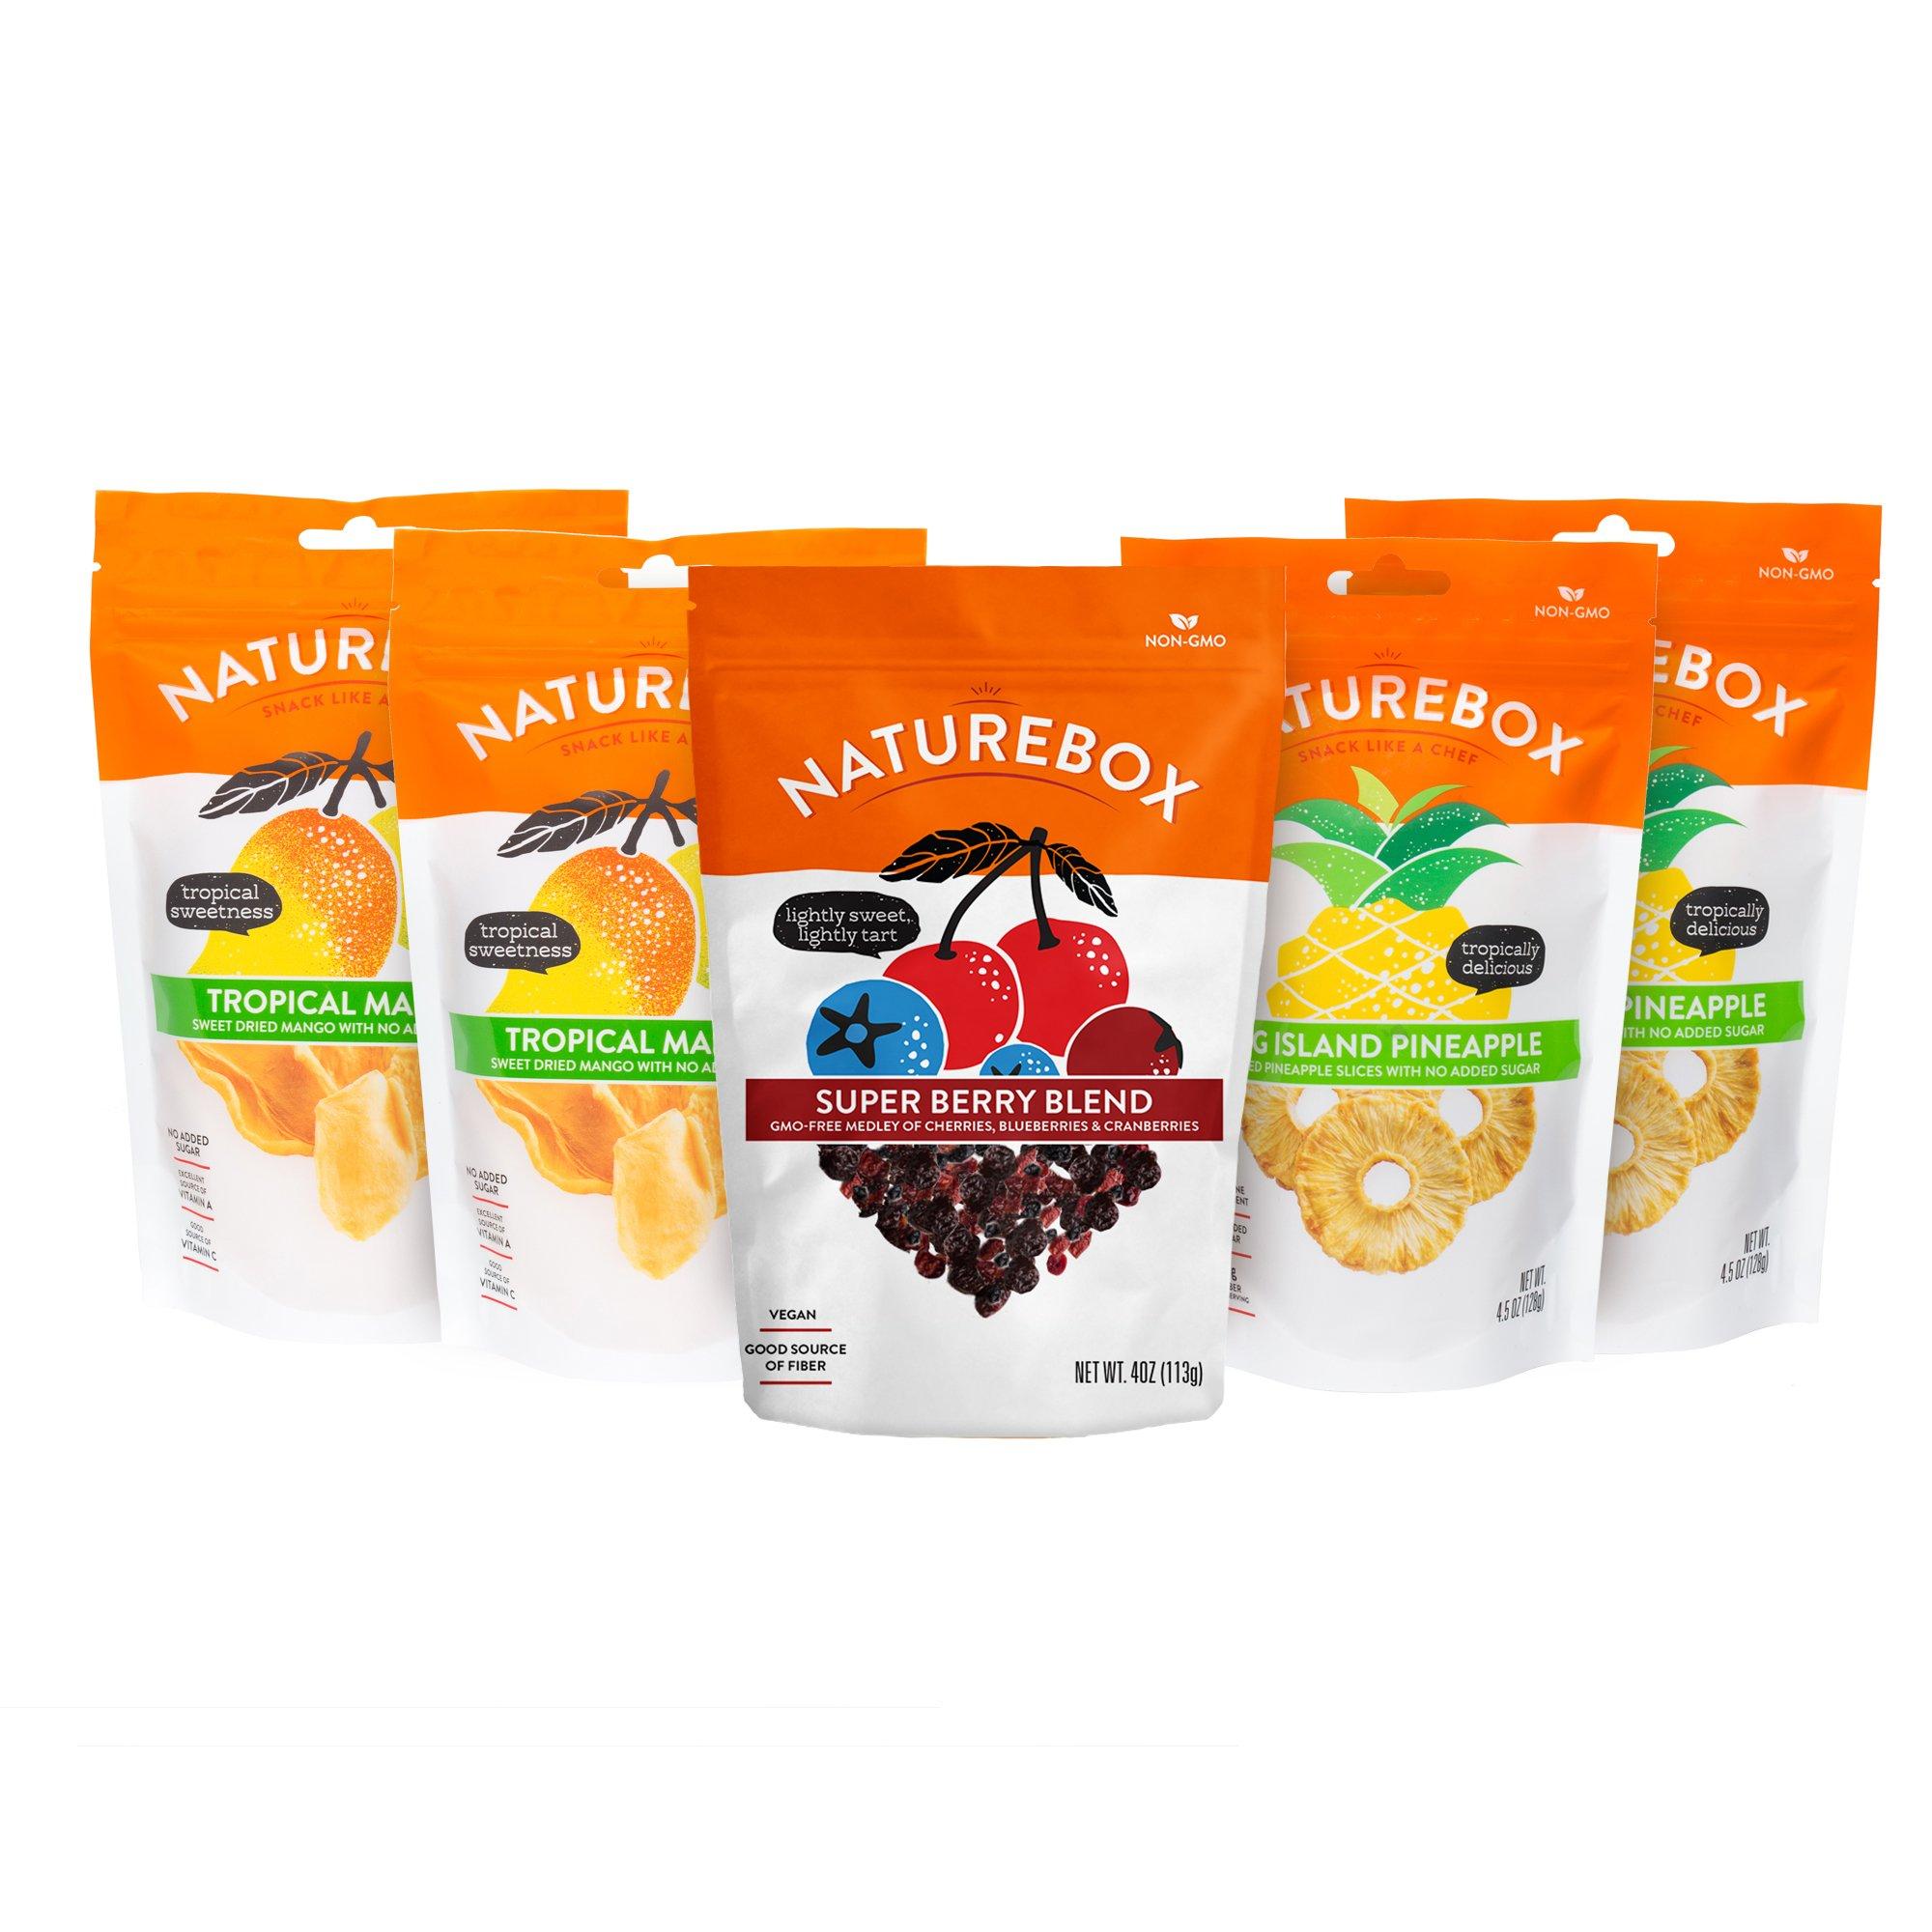 NatureBox Non-GMO Dried Fruit Sampler (5 bags) - Mango, Pineapple, Cherry, Cranberry, and Blueberry - Vegan Friendly